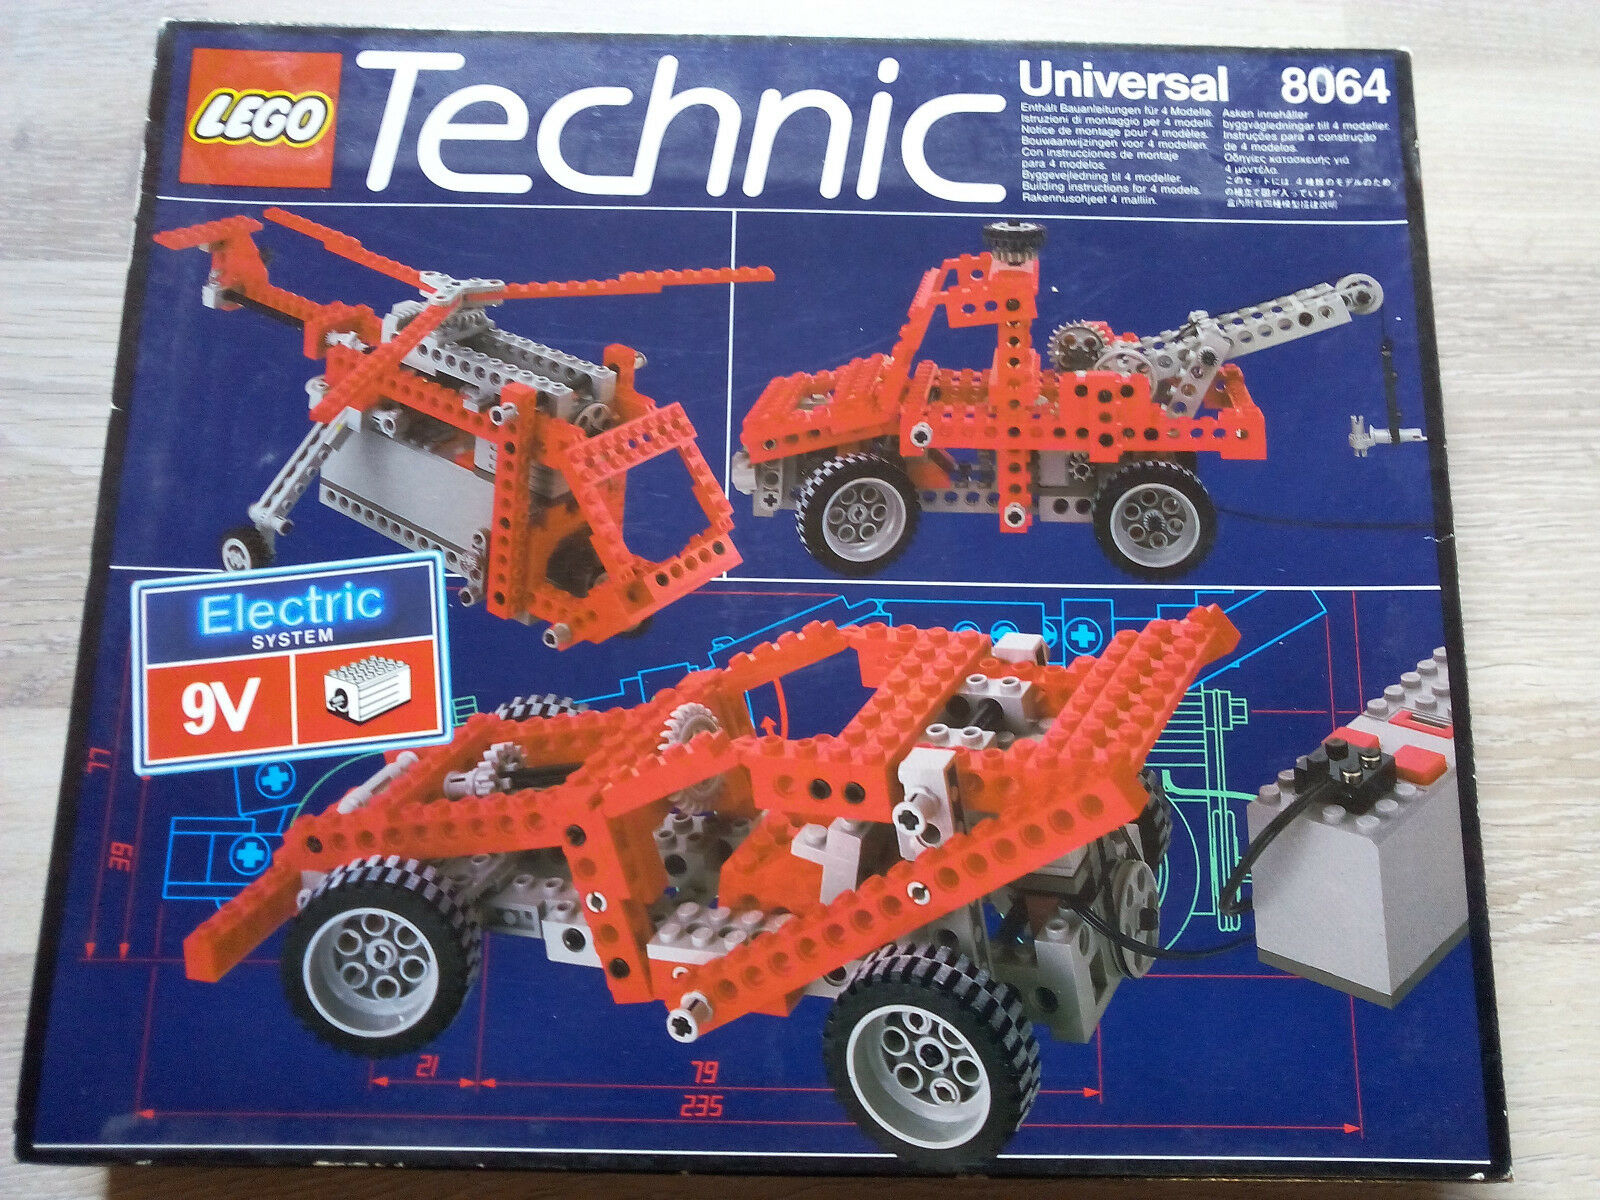 Lego Technic Technik 8064 Universal 9V Motor Set   NEU & OVP - RARITÄT